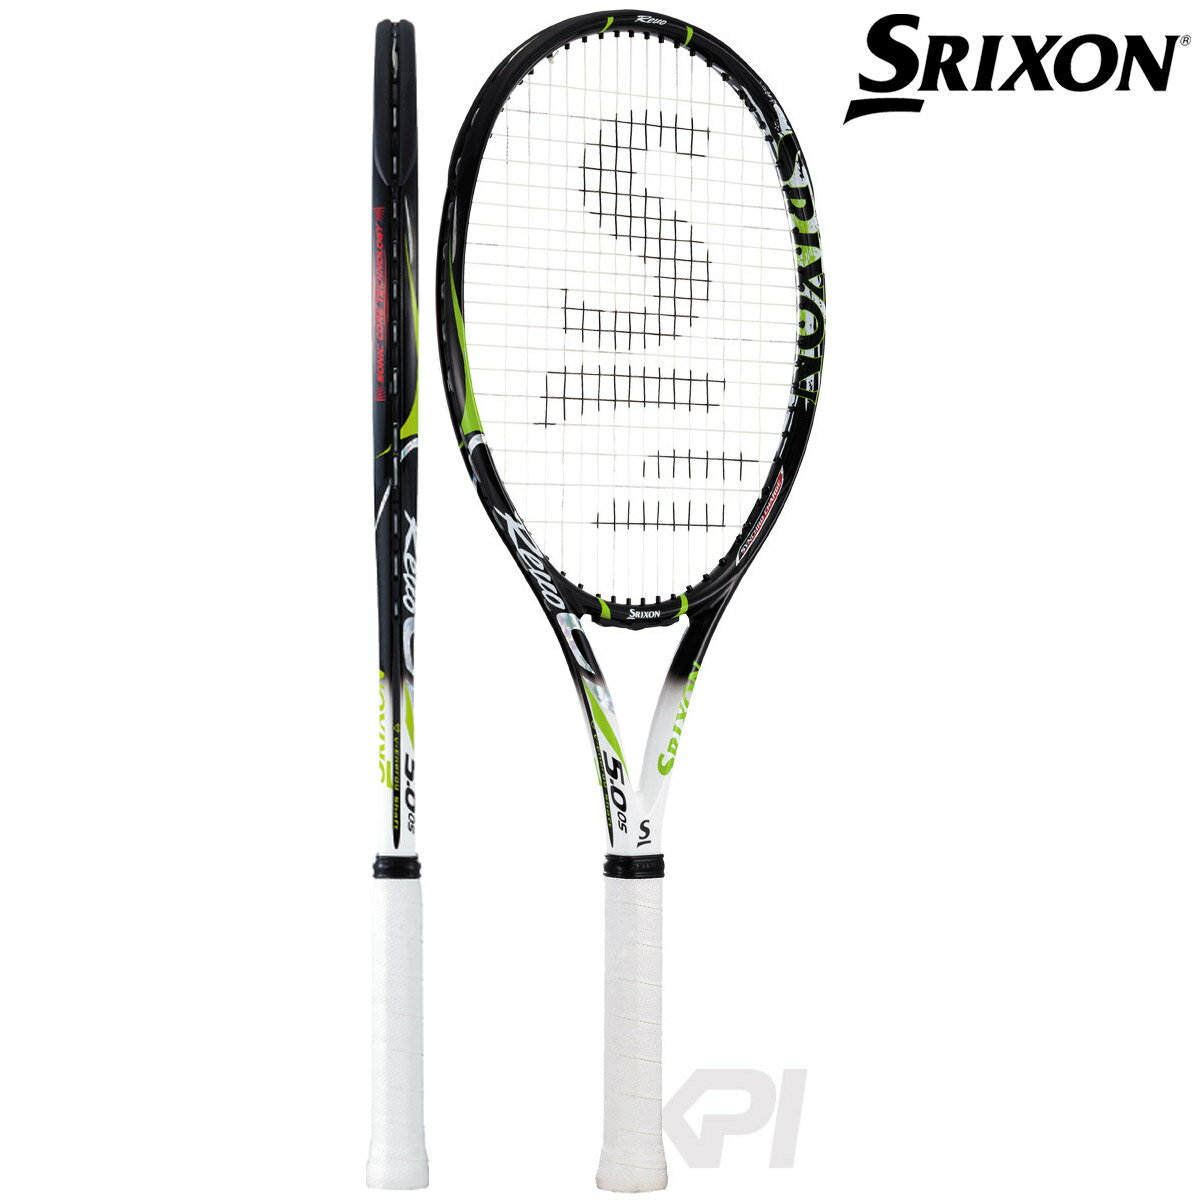 SRIXON(スリクソン)【SRIXON REVO CV 5.0 OS(スリクソンレヴォ 5.0 OS) SR21604】硬式テニスラケット【kpisports】